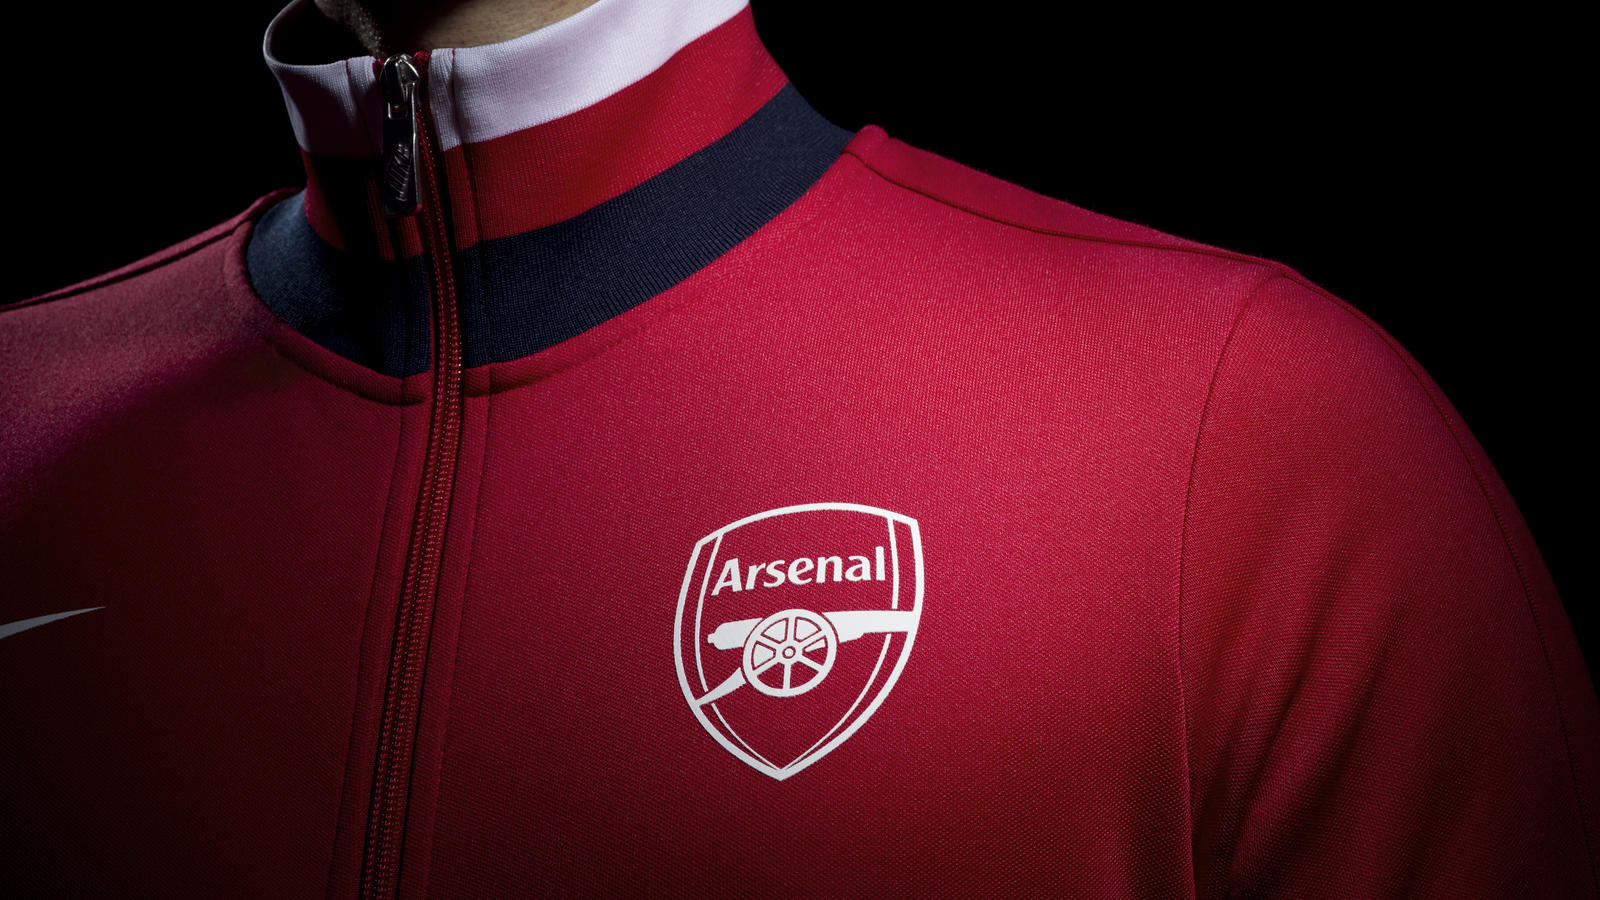 05808a386 Fa12 Authentic Arsenal H N98 Crest SM R.  Fa12 Authentic Arsenal H N98 Back SM R. Fa12 Authentic Arsenal H Crest SM R